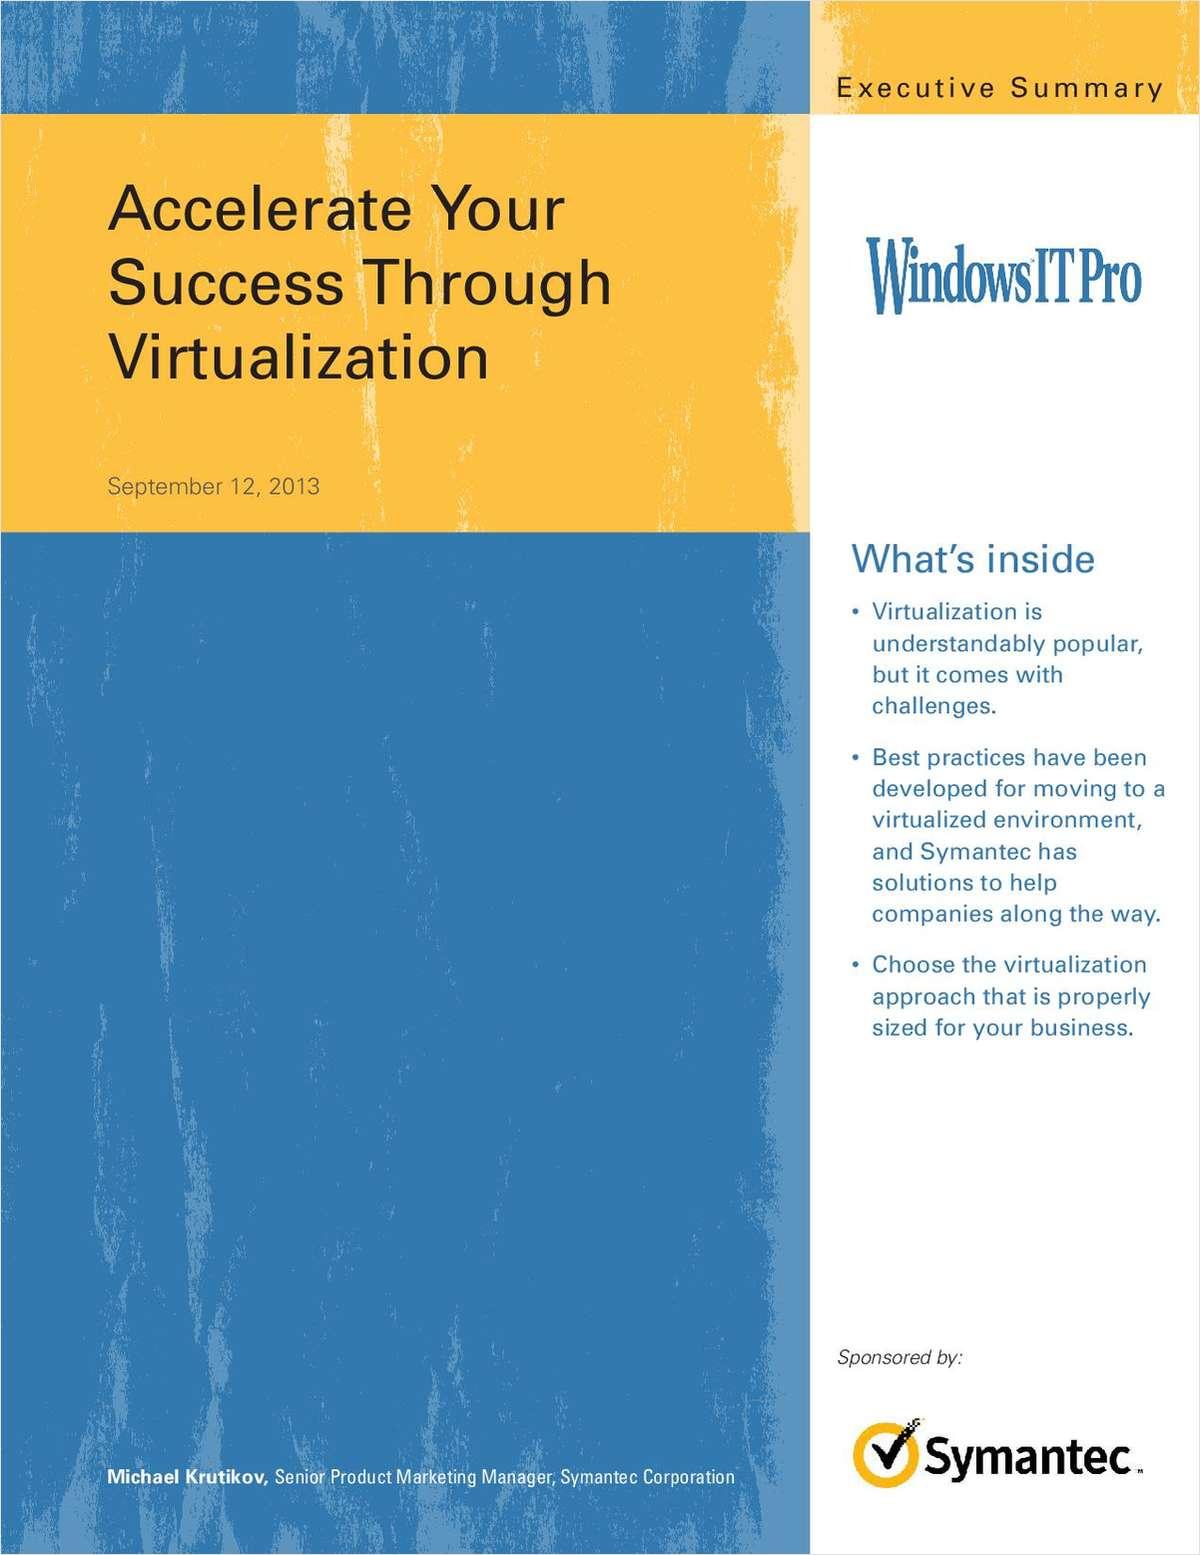 Accelerate Your Success Through Virtualization